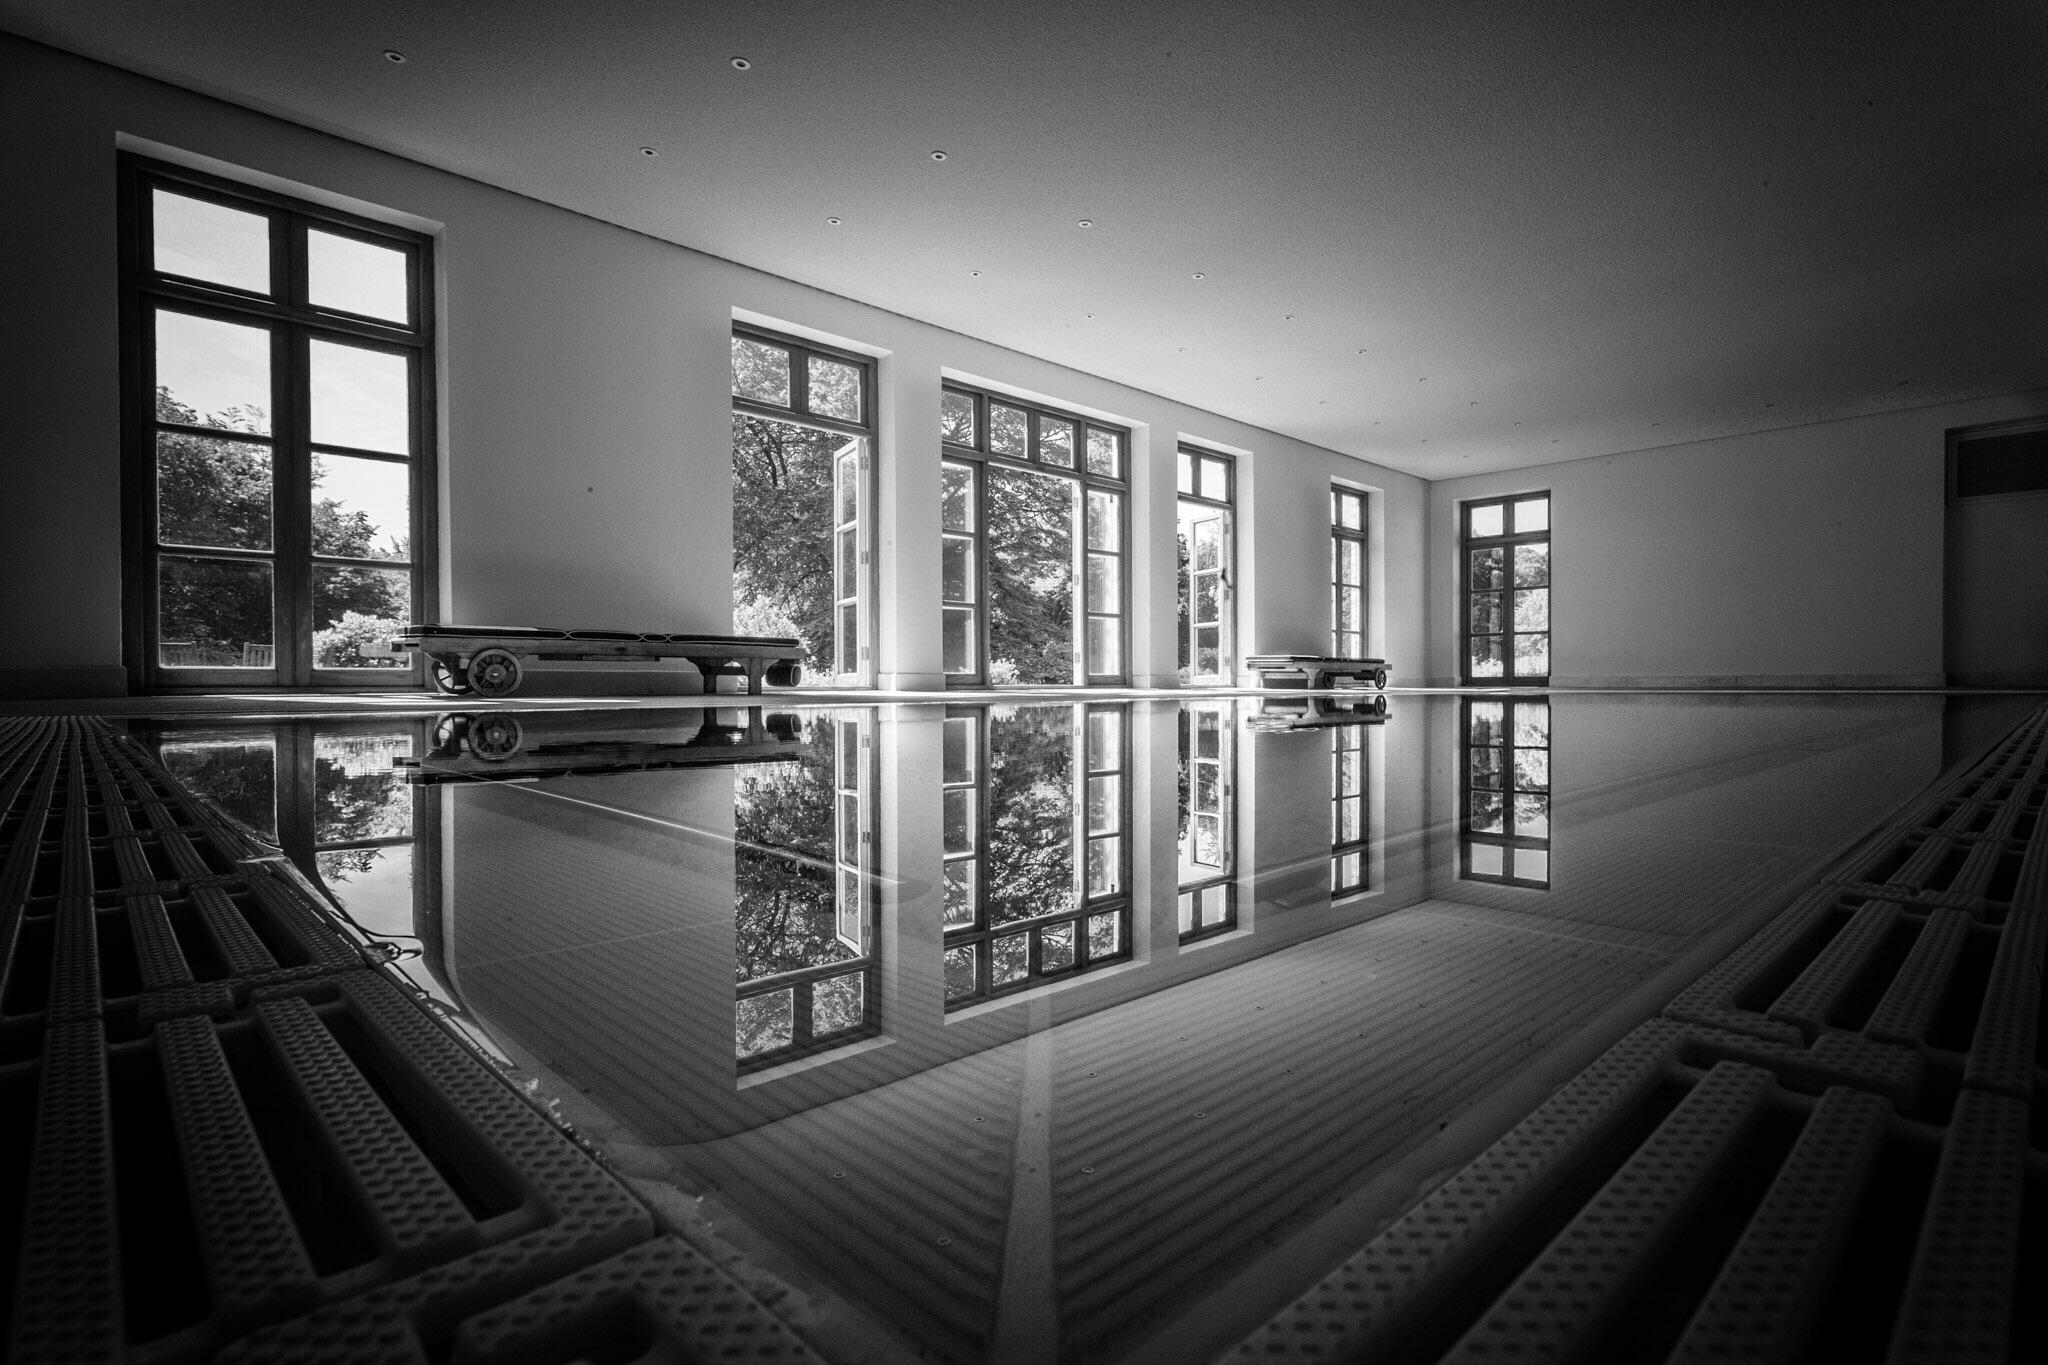 Black and white interior design photography